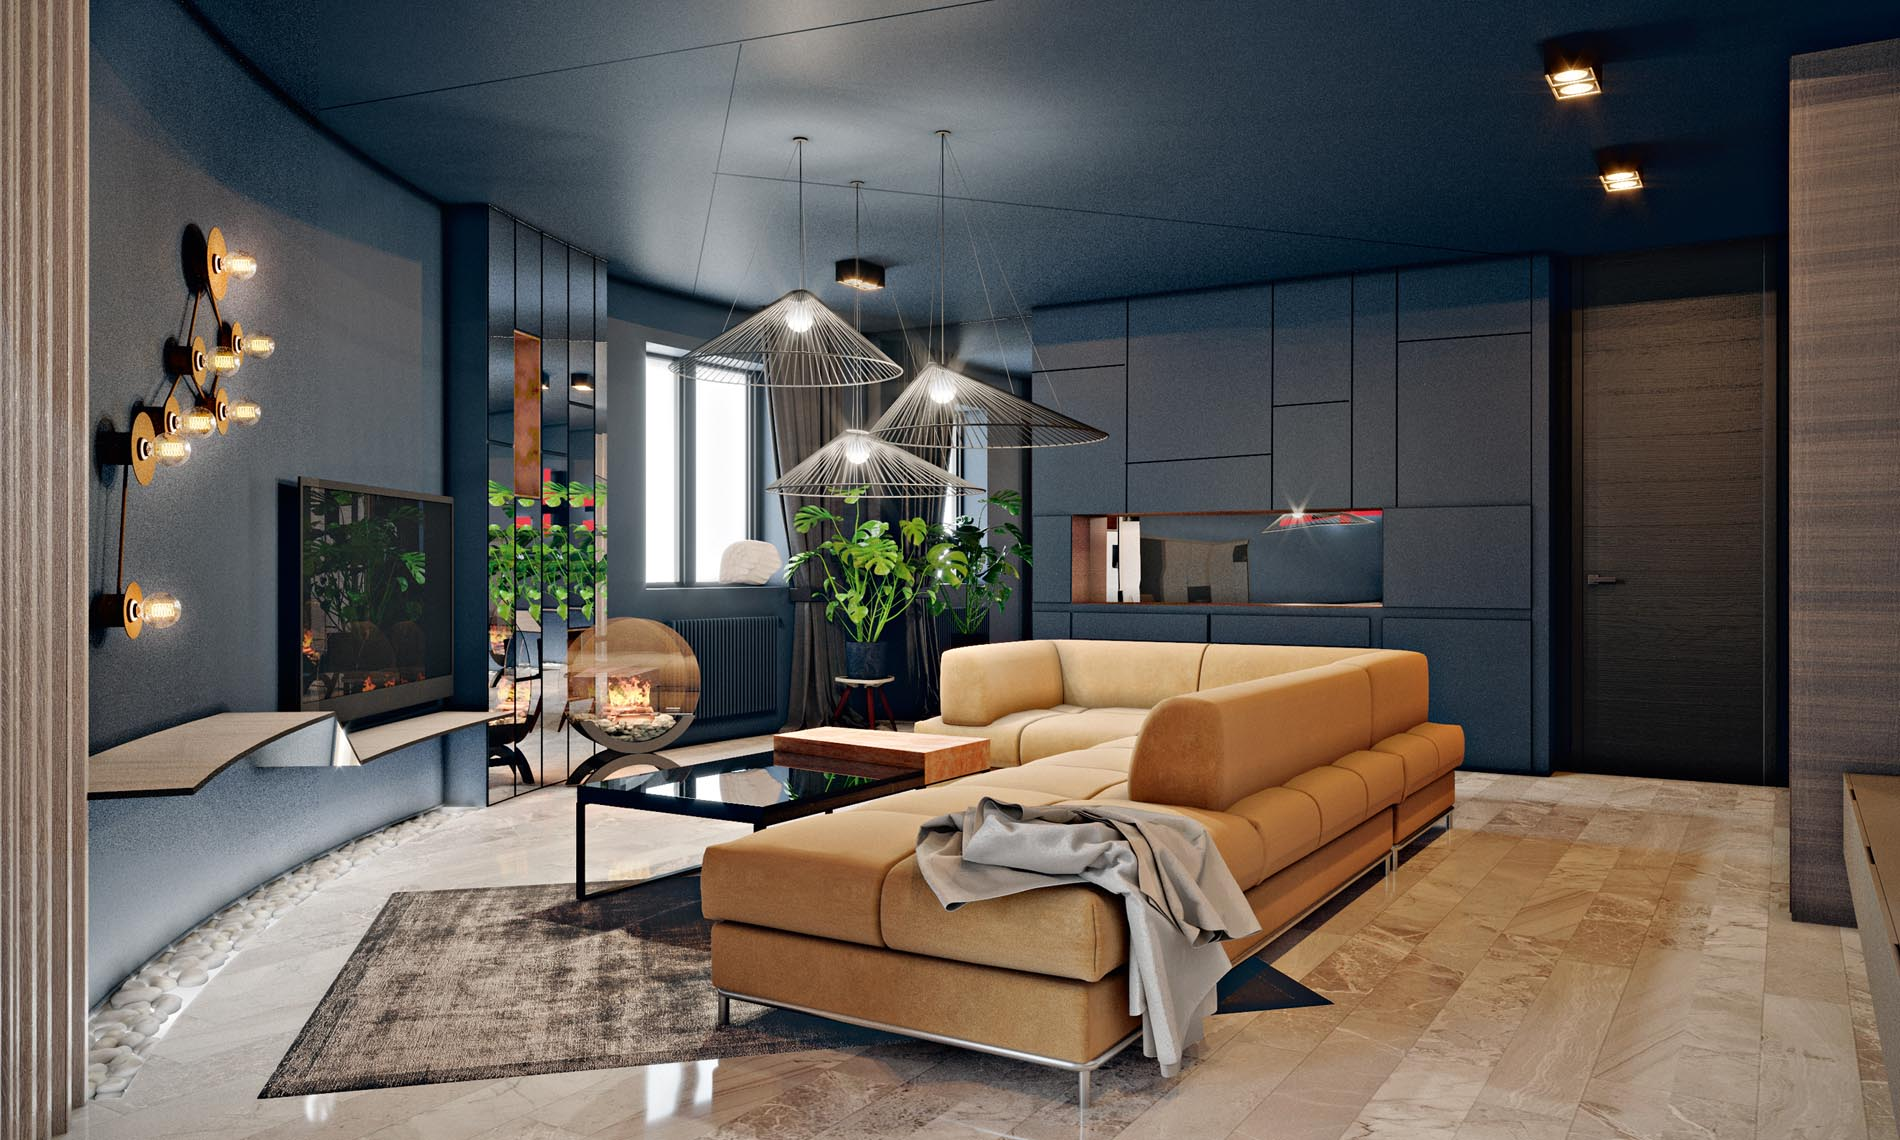 Интерьер трехкомнатной квартиры в серых тонах